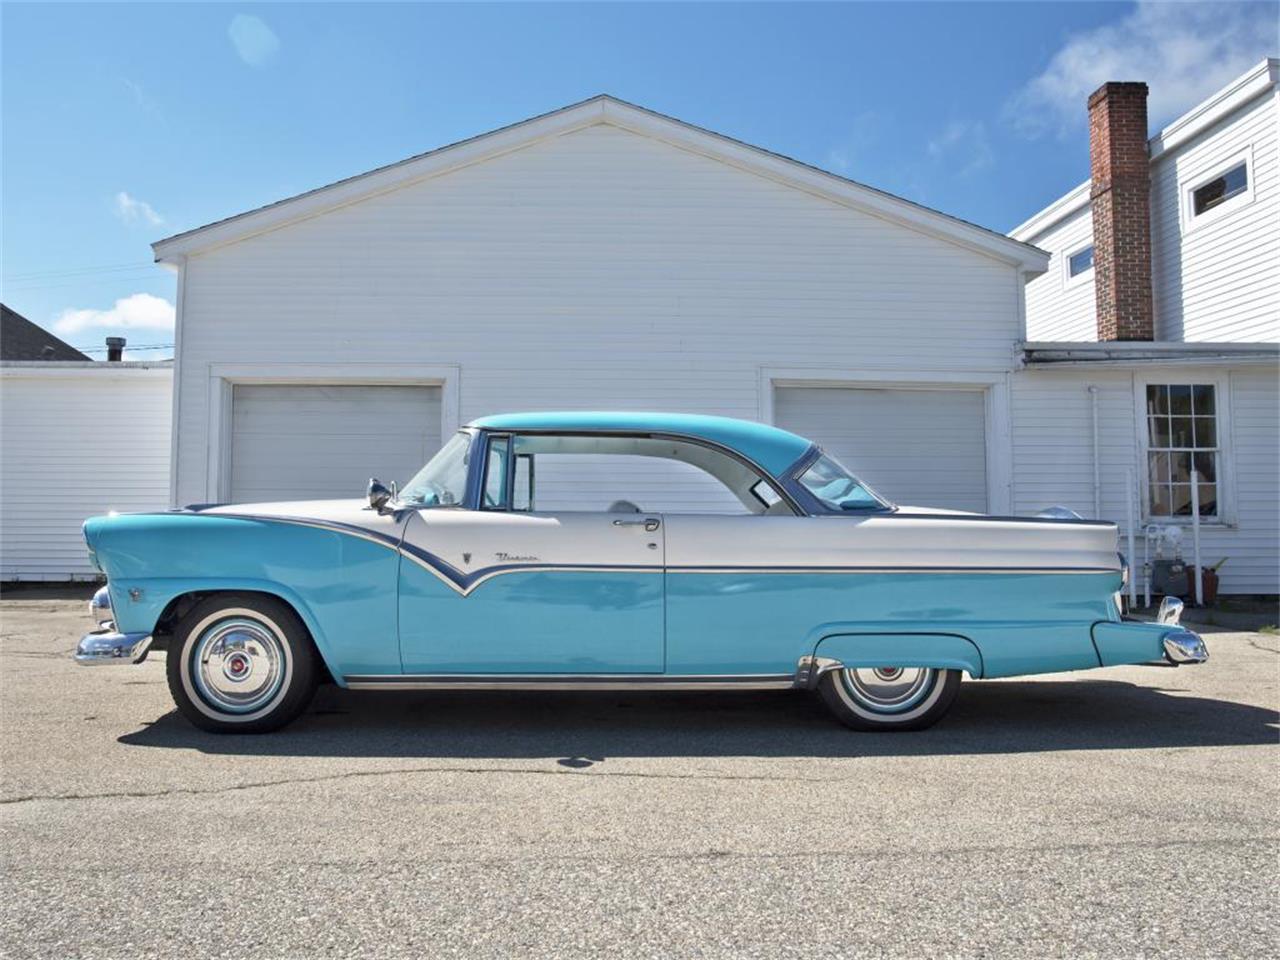 1955 Ford Victoria For Sale Classiccars Com Cc 995214